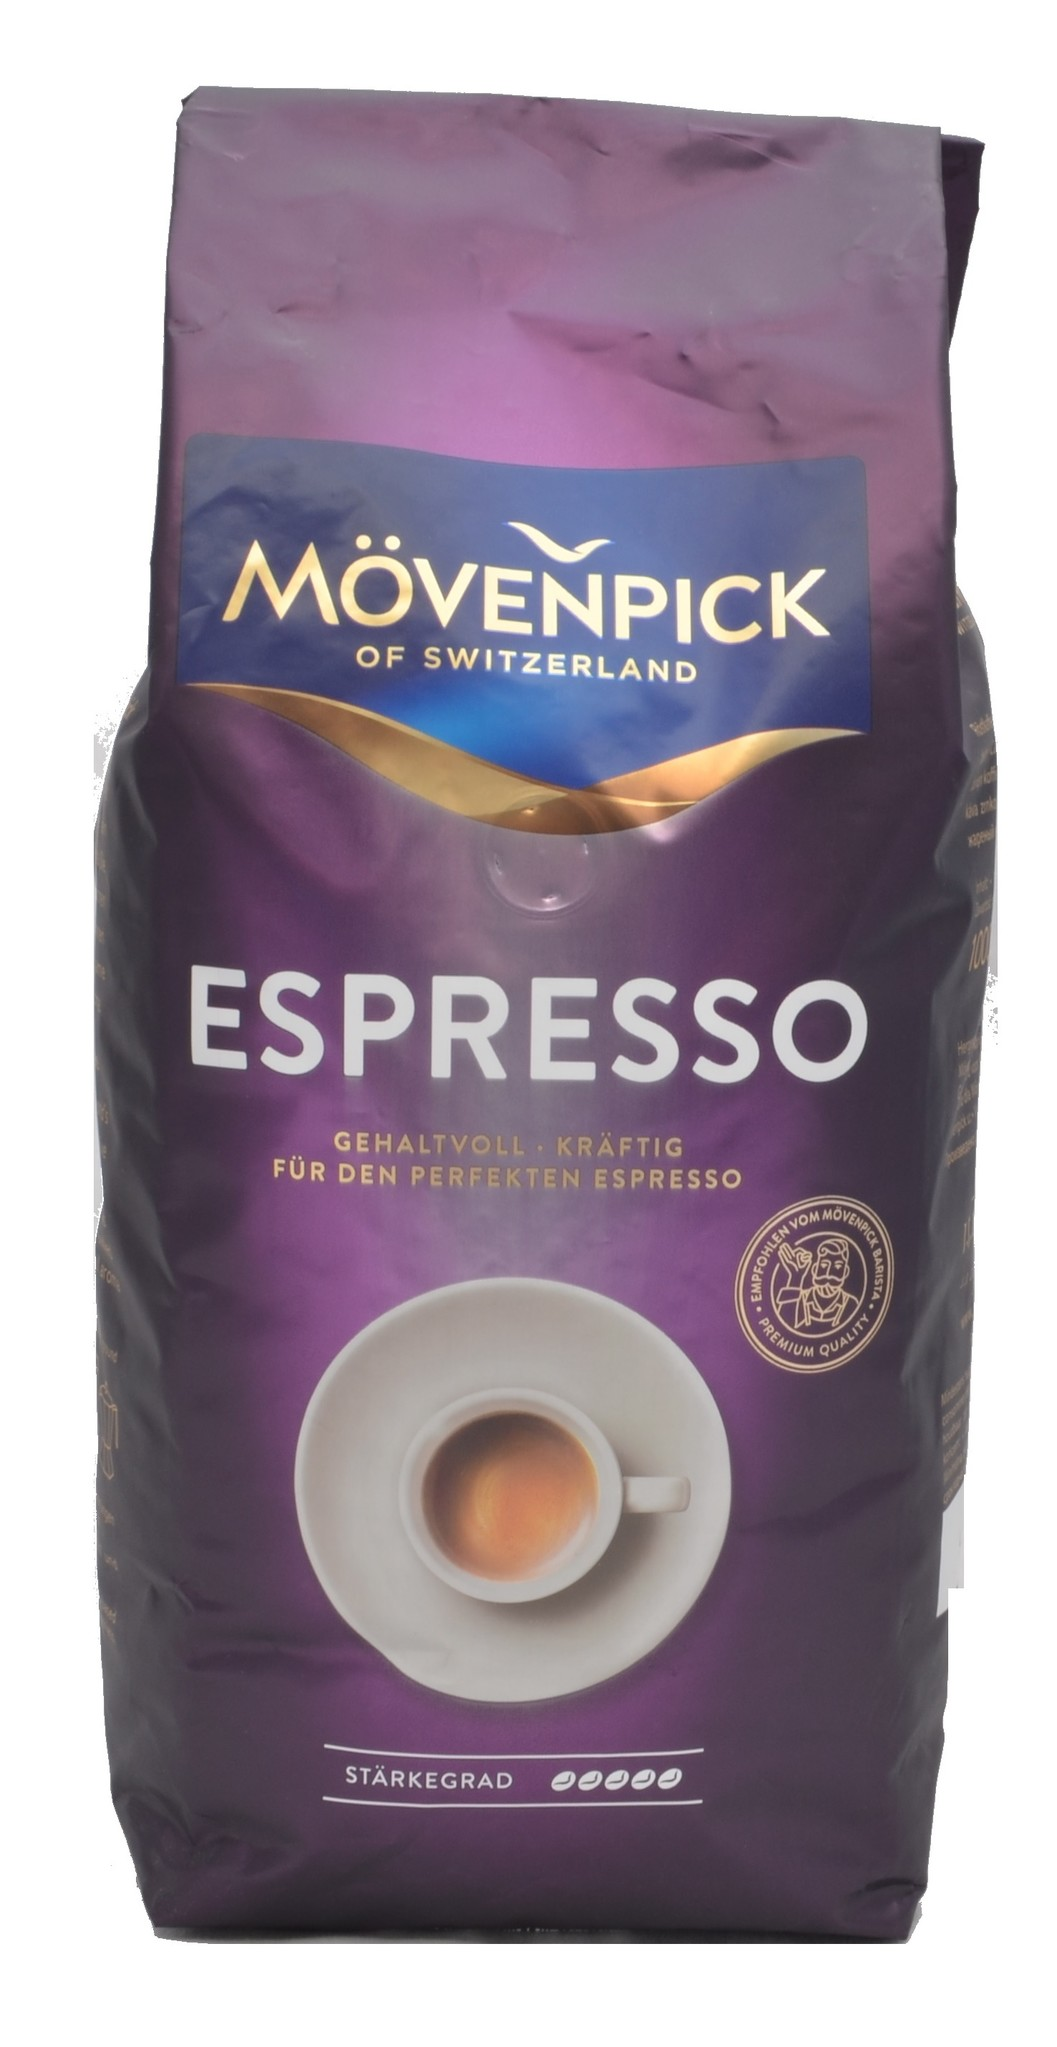 Mövenpick Espresso bonen 1 kg. nu vanaf € 7.50